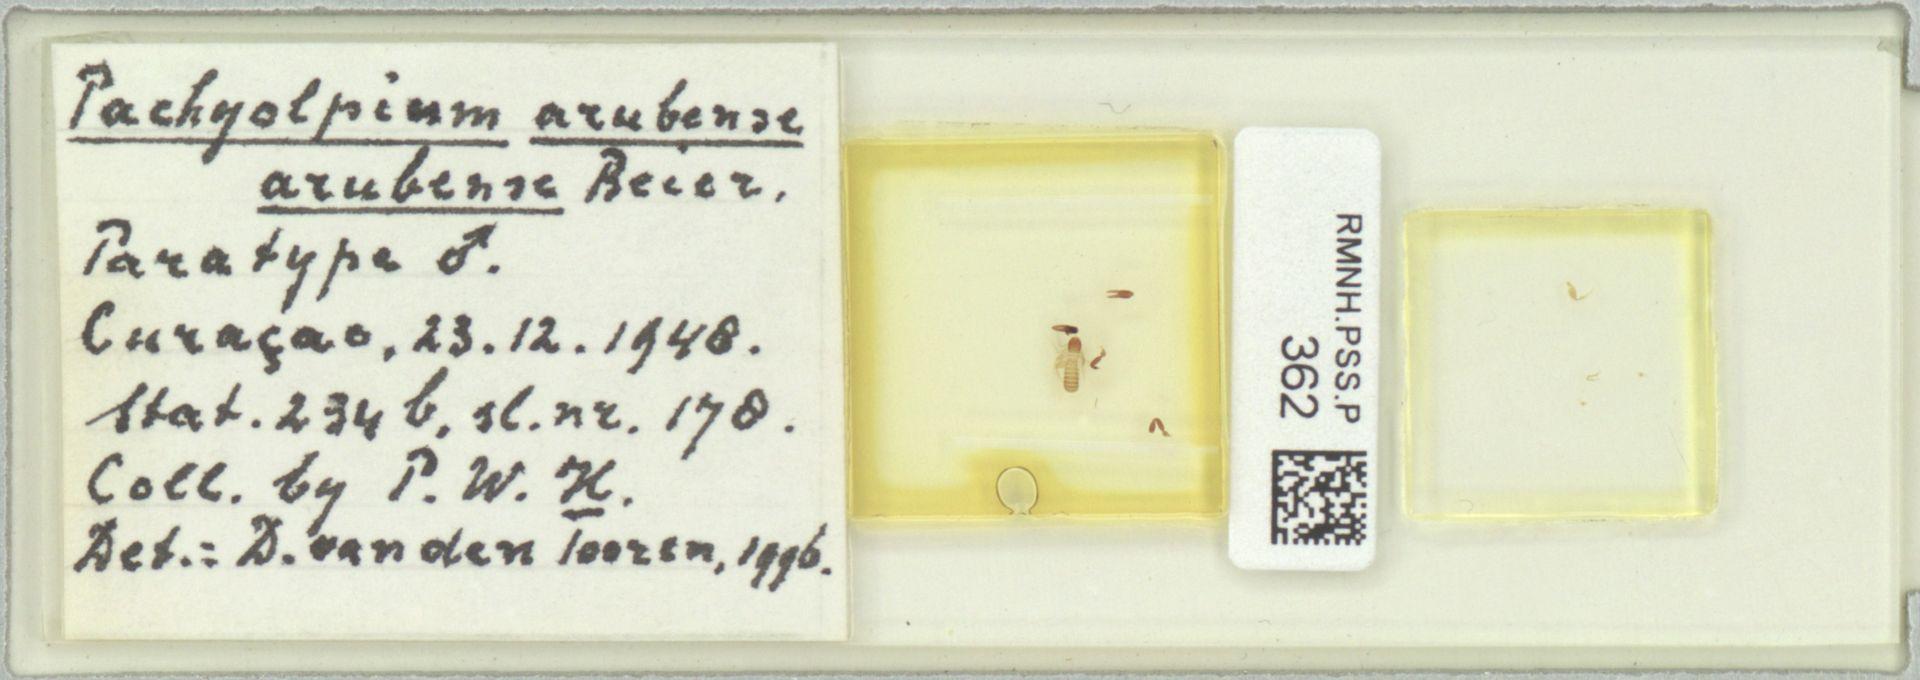 RMNH.PSS.P.362 | Pachyolpium arubense arubense